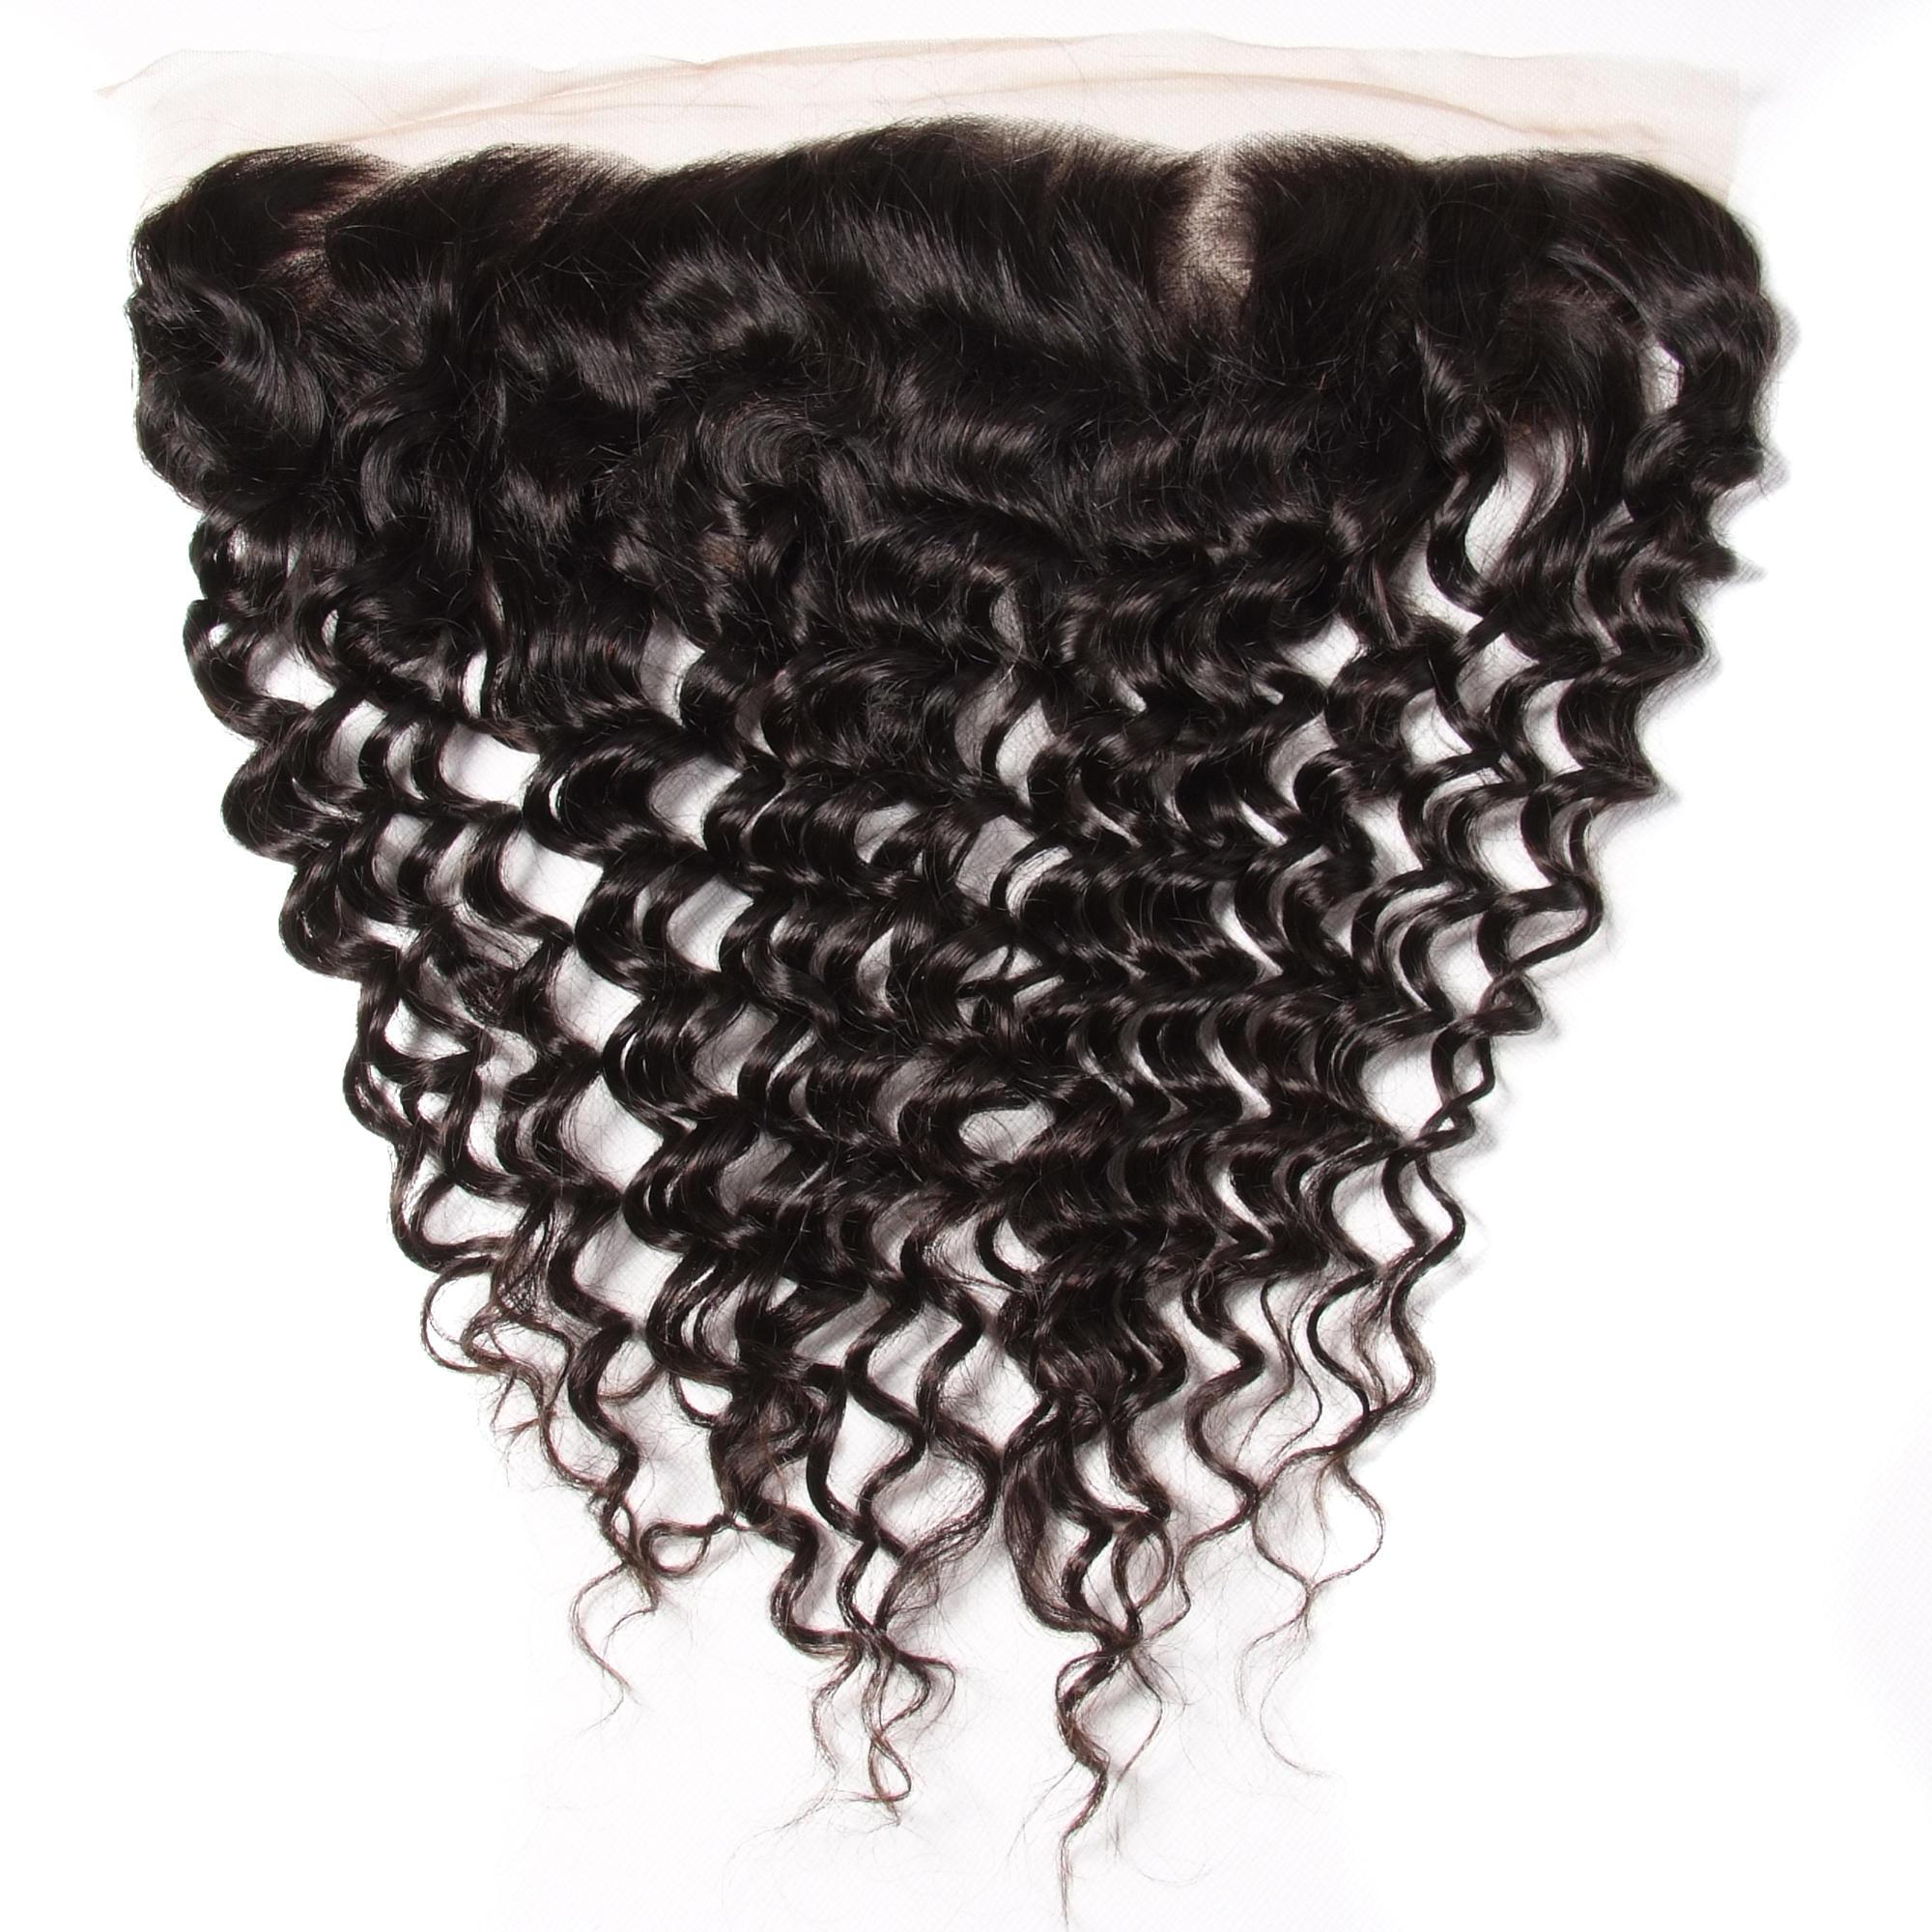 UNice Hair image 29